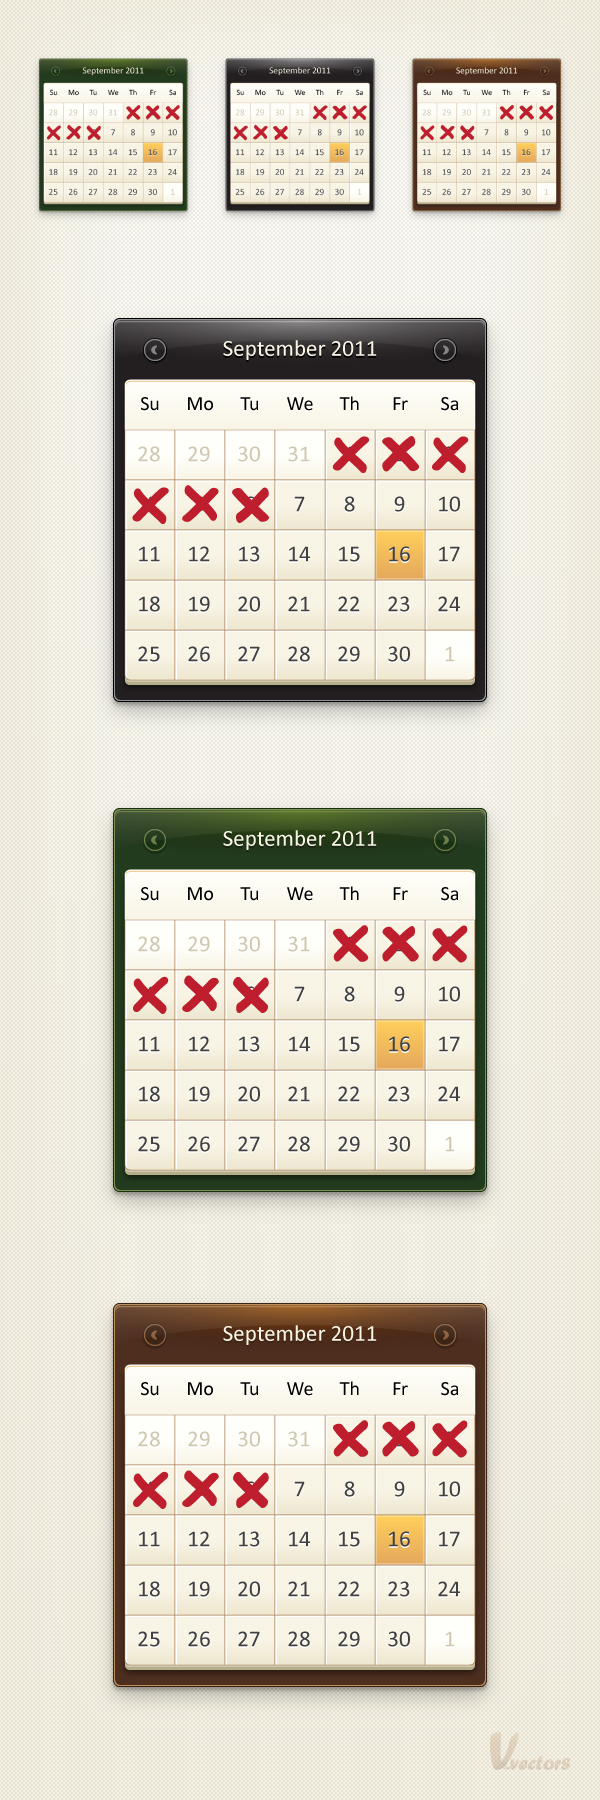 Calendar Design Tutorial : How to create a calendar icon in illustrator